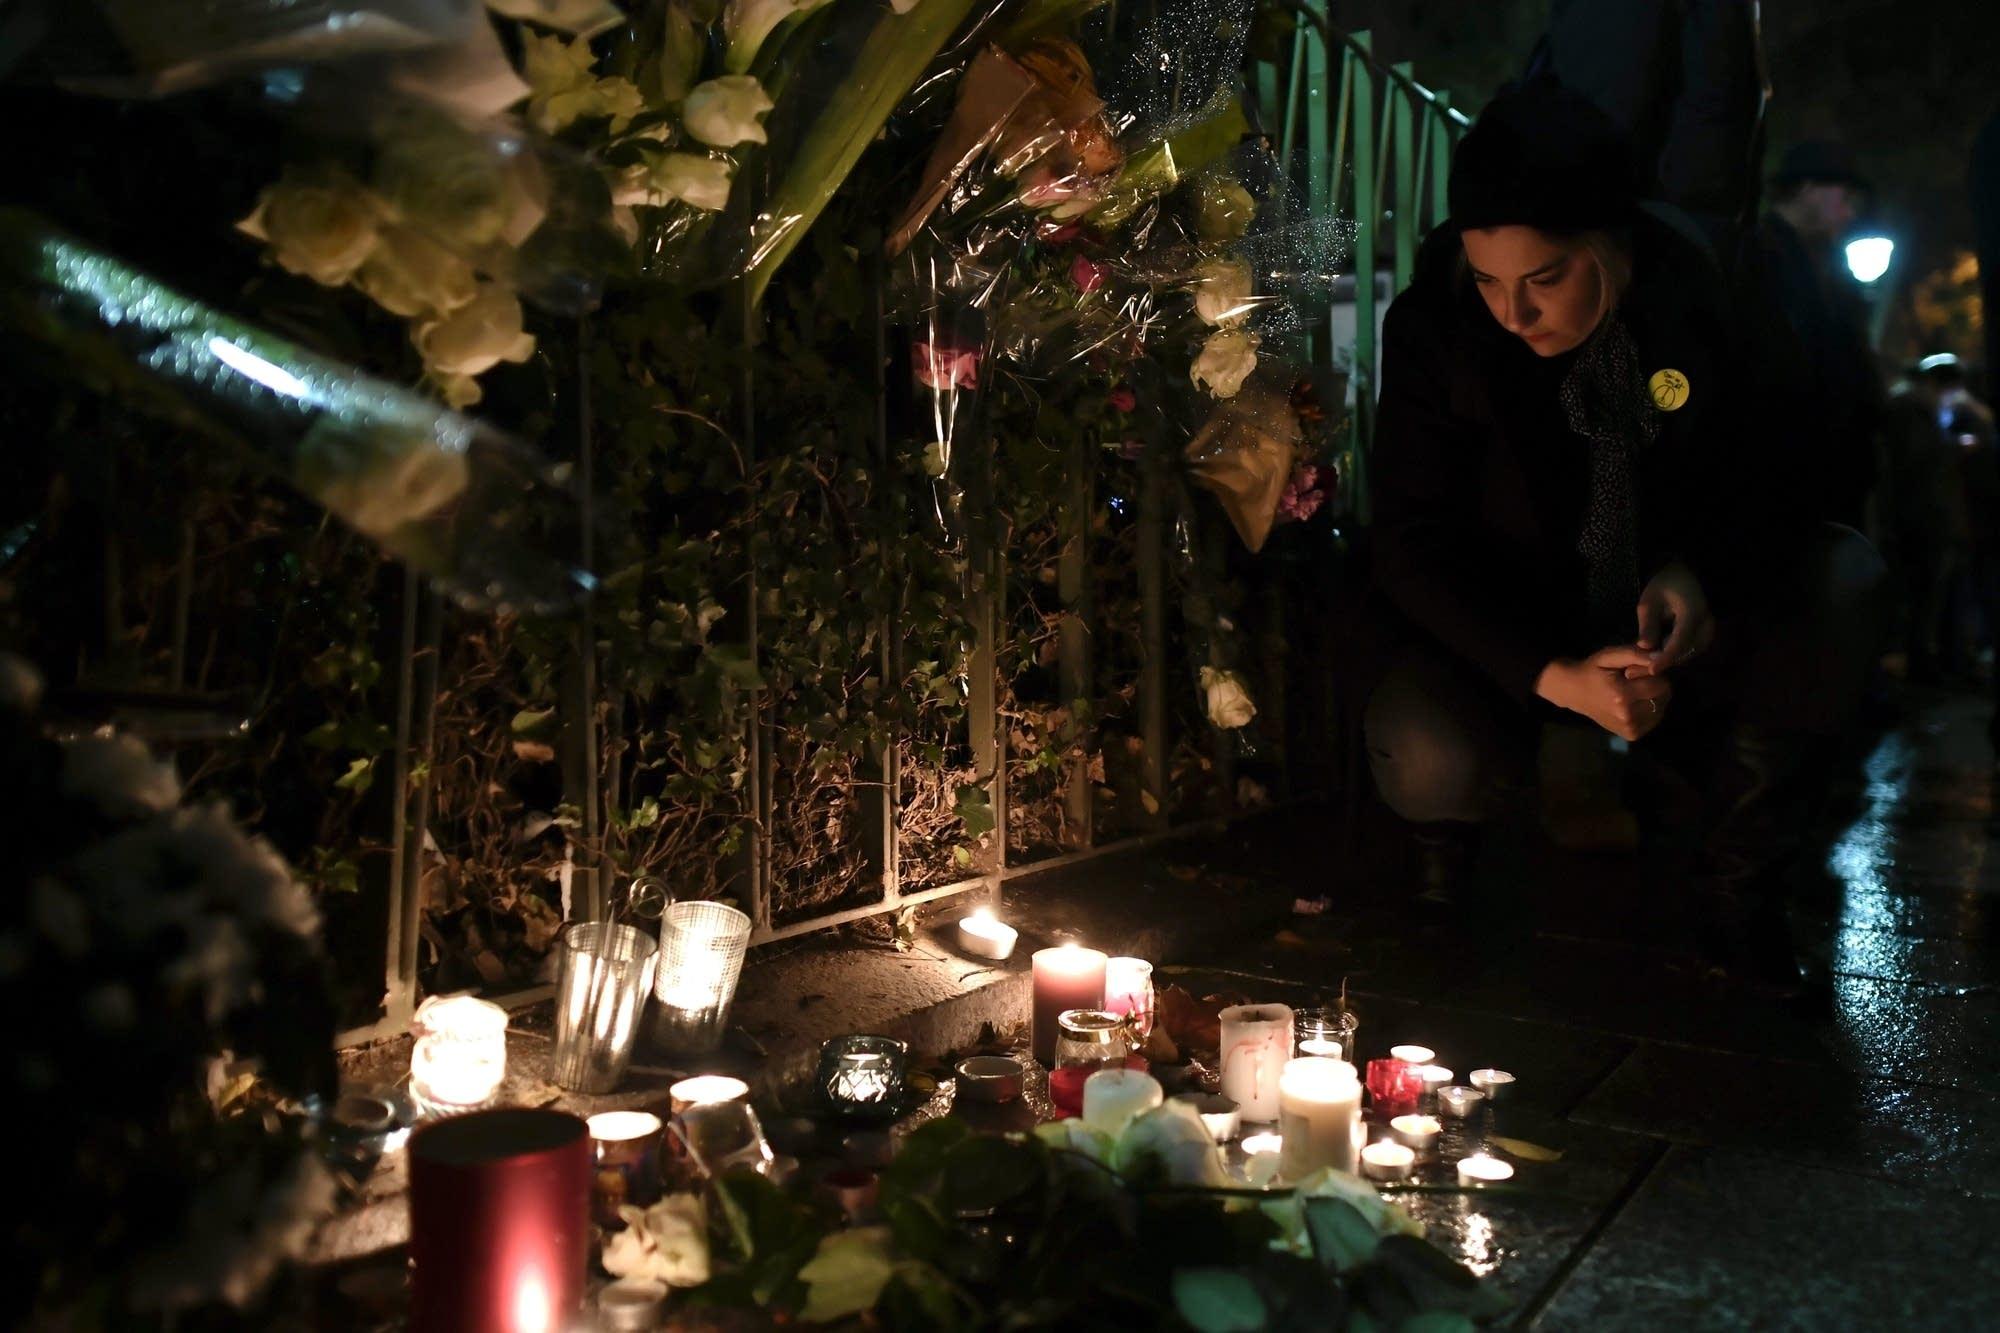 A vigil outside the Bataclan